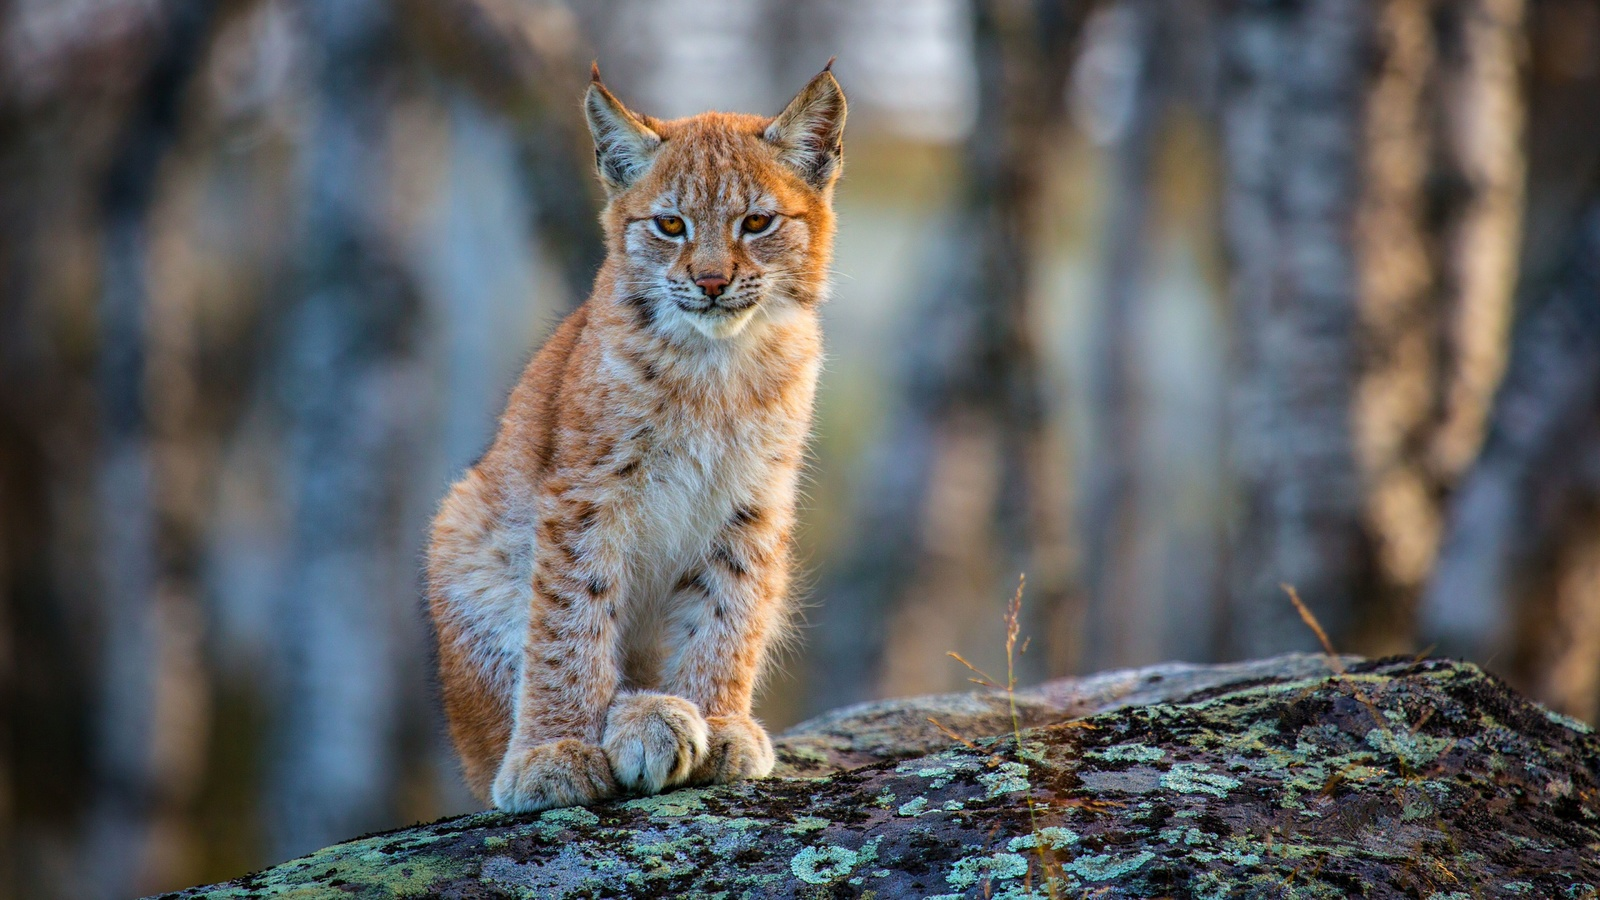 рысь, lynx, кошка, кот, рыжий